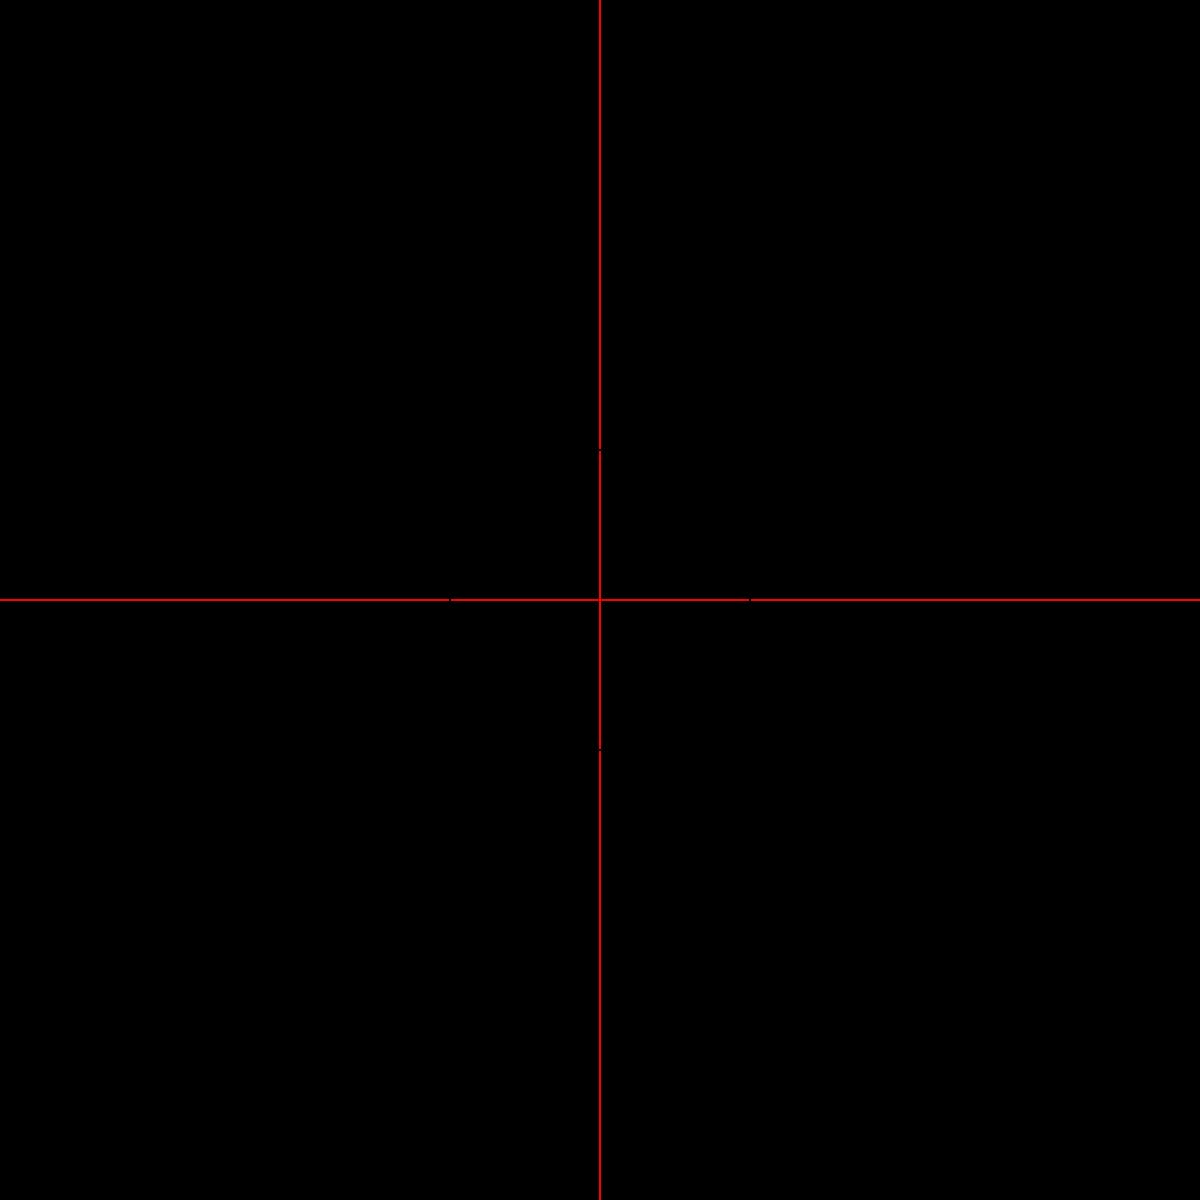 三次元占星術(2)_e0051428_1474789.png